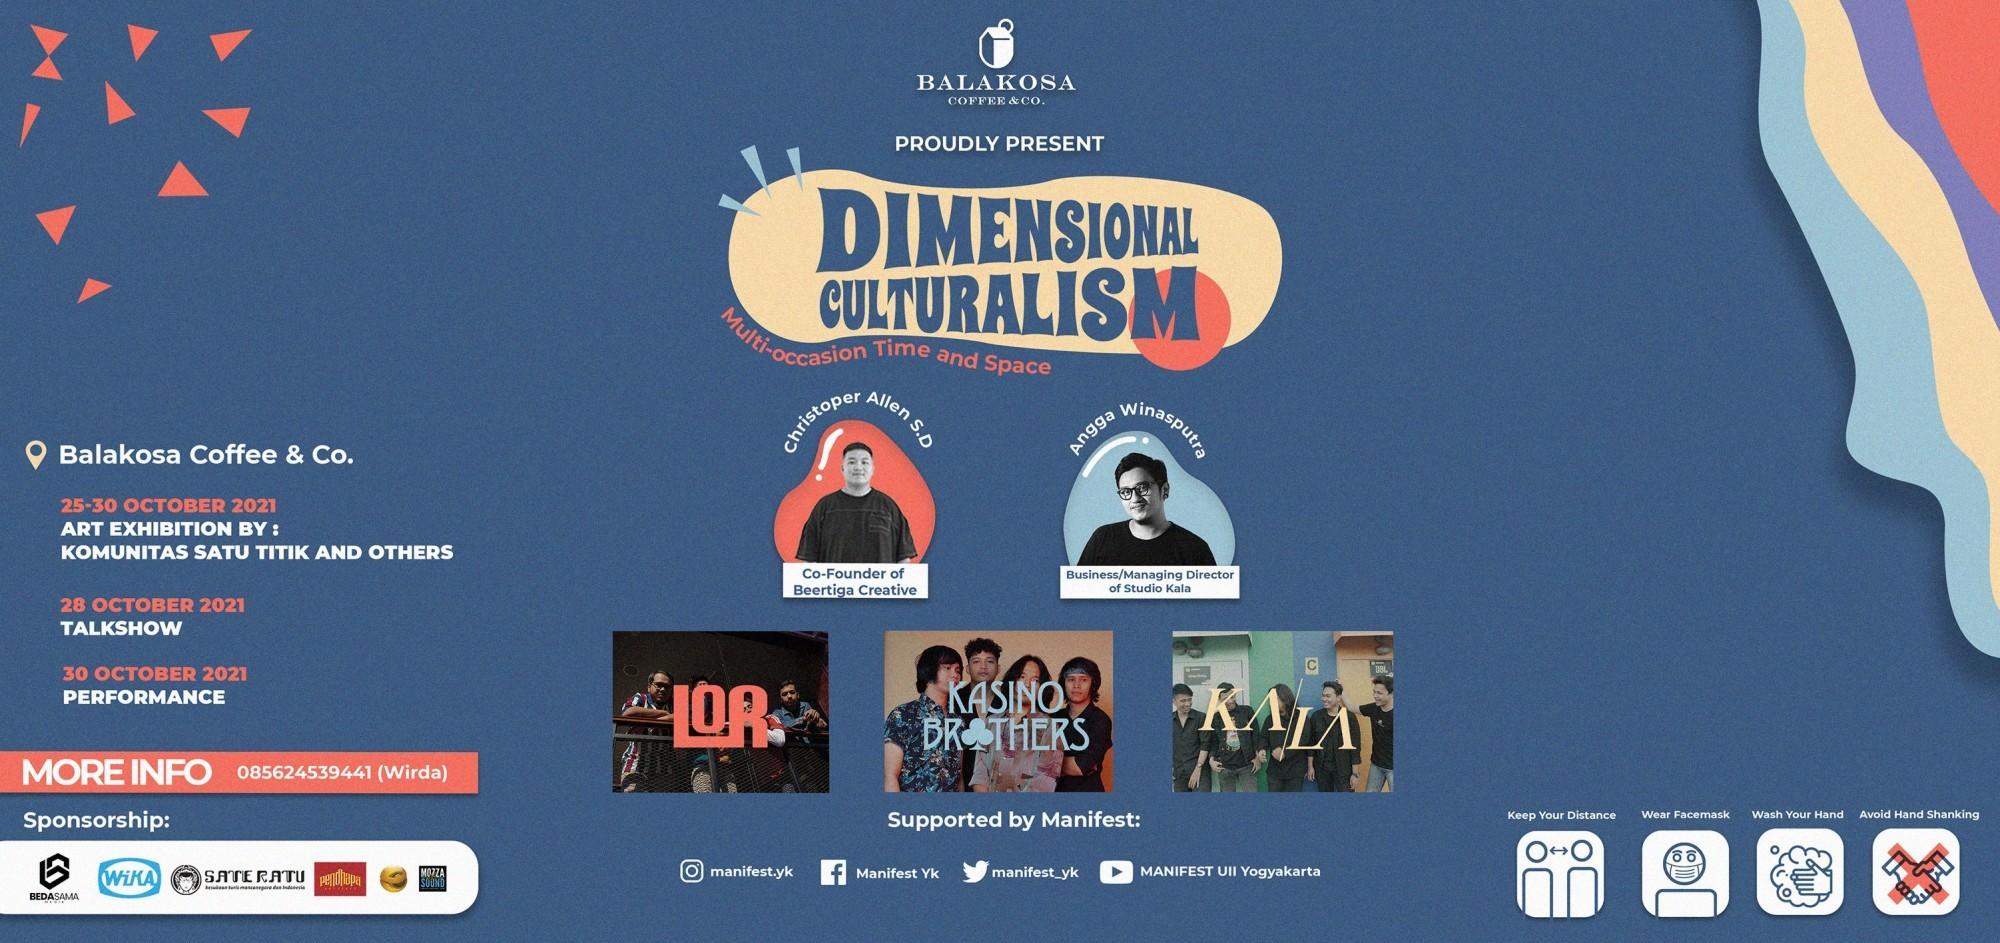 Dimensional Culturalism